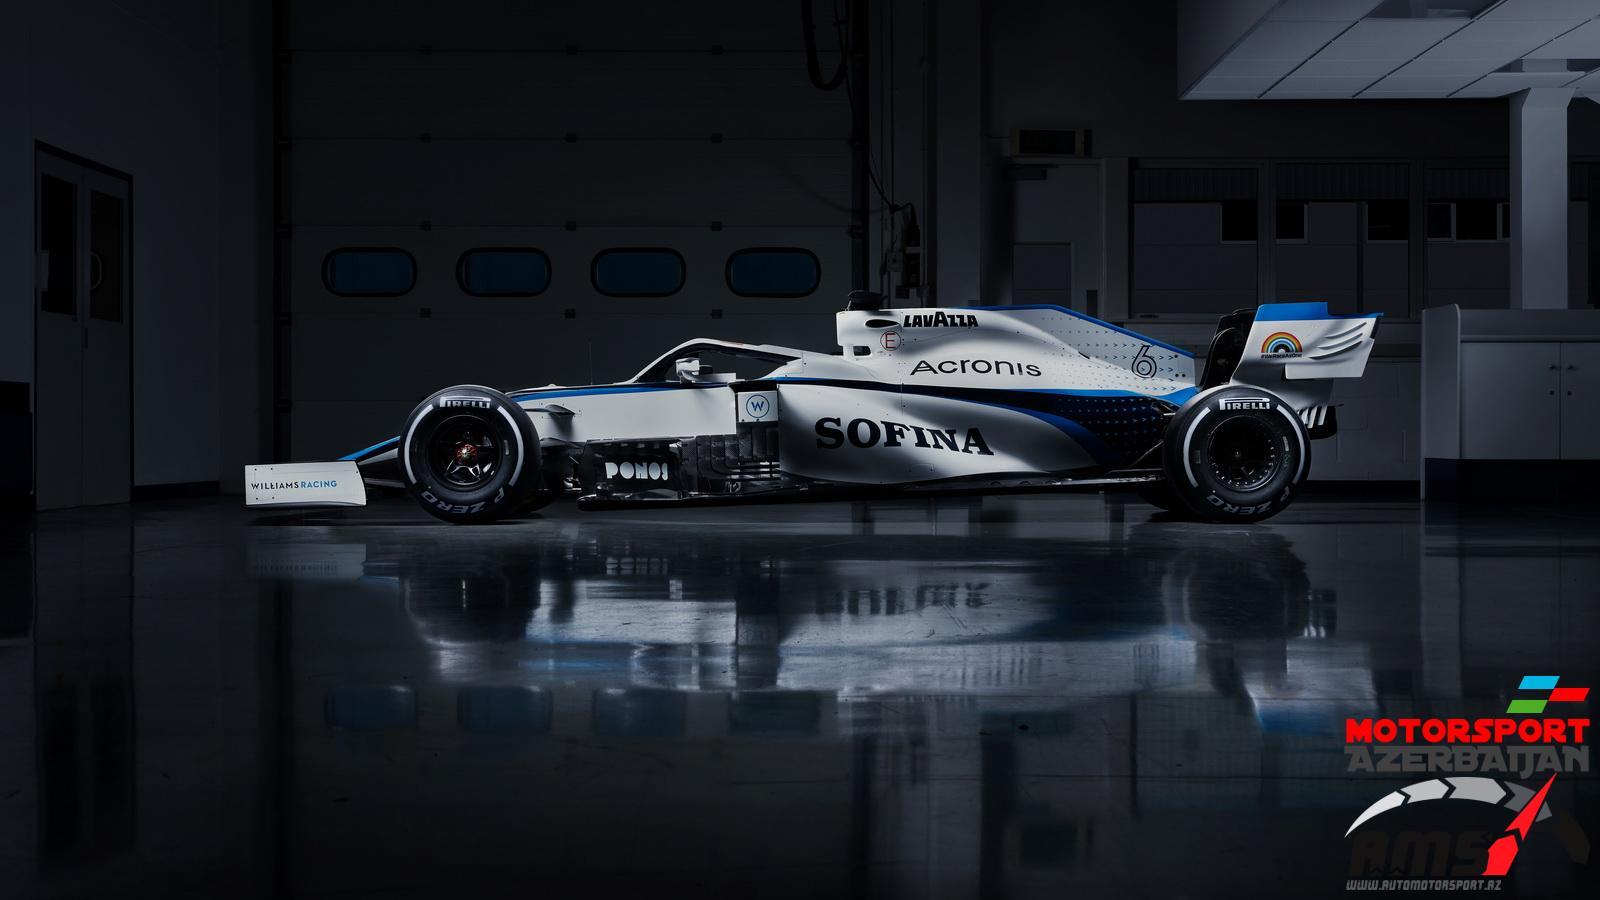 Williams Racing 2020 Livery